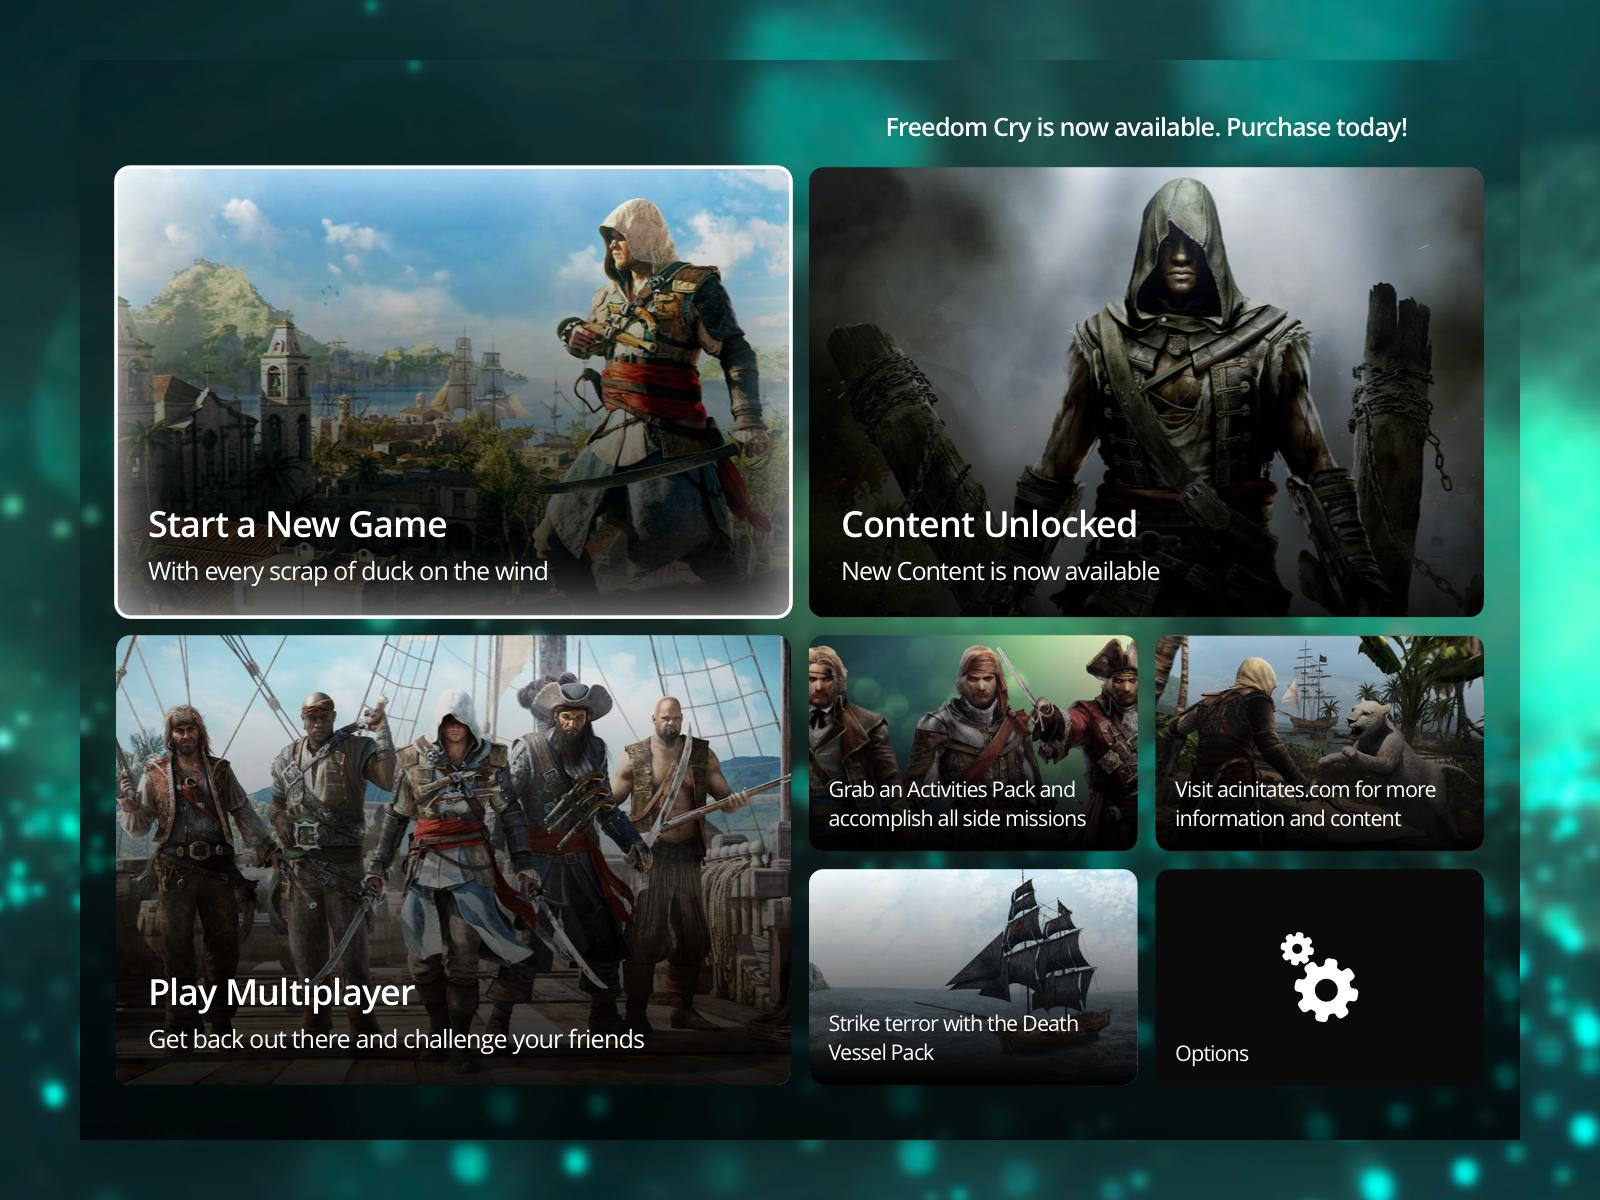 Assassin's Creed IV: Black Flag UI